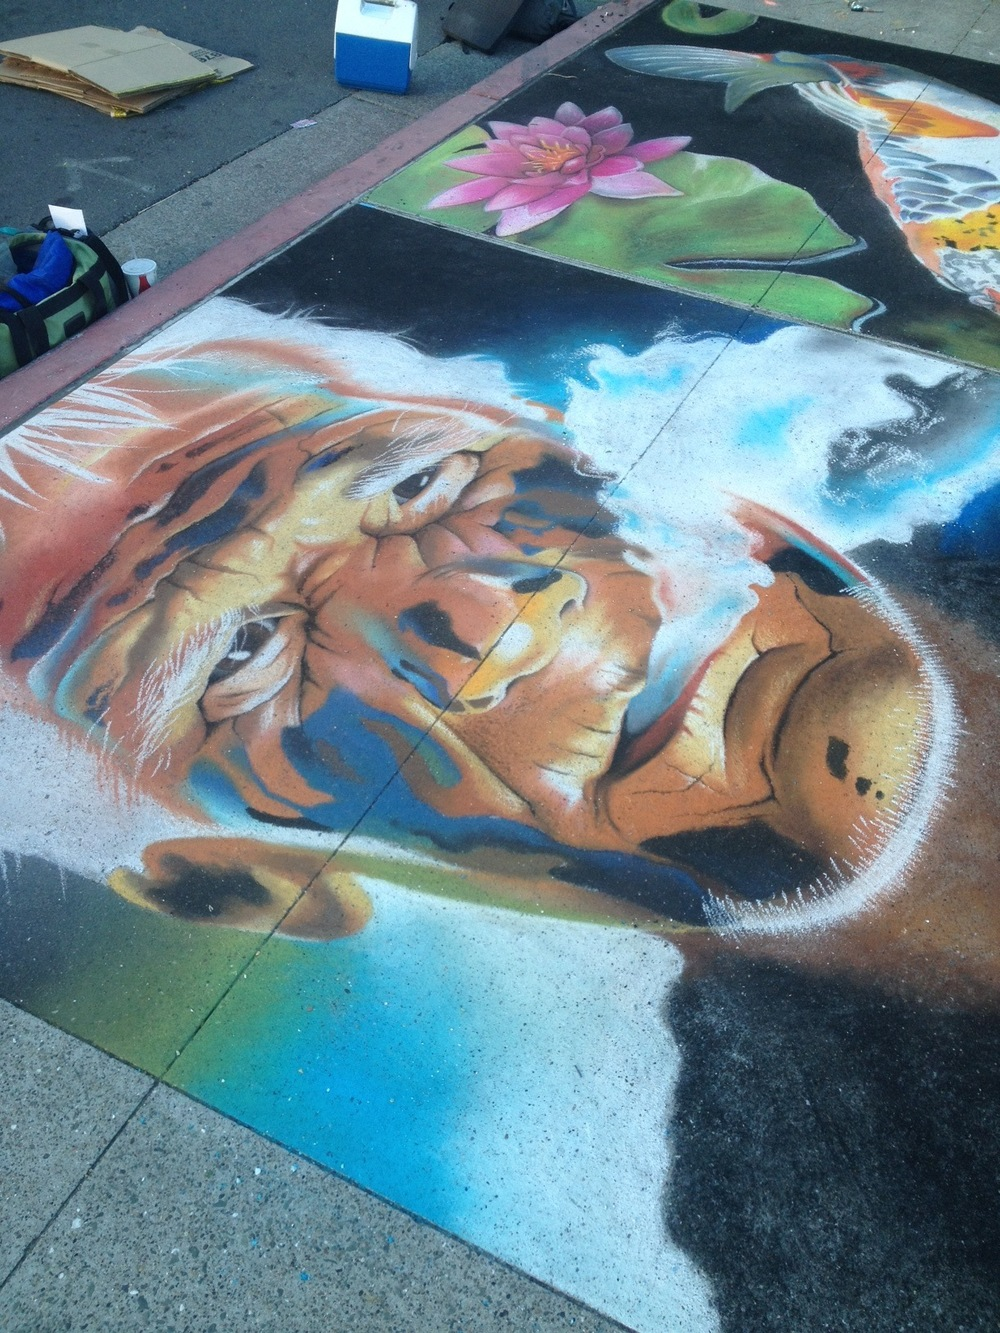 6x6'  |  Martinez Street Painting Festival, CA   |   2013